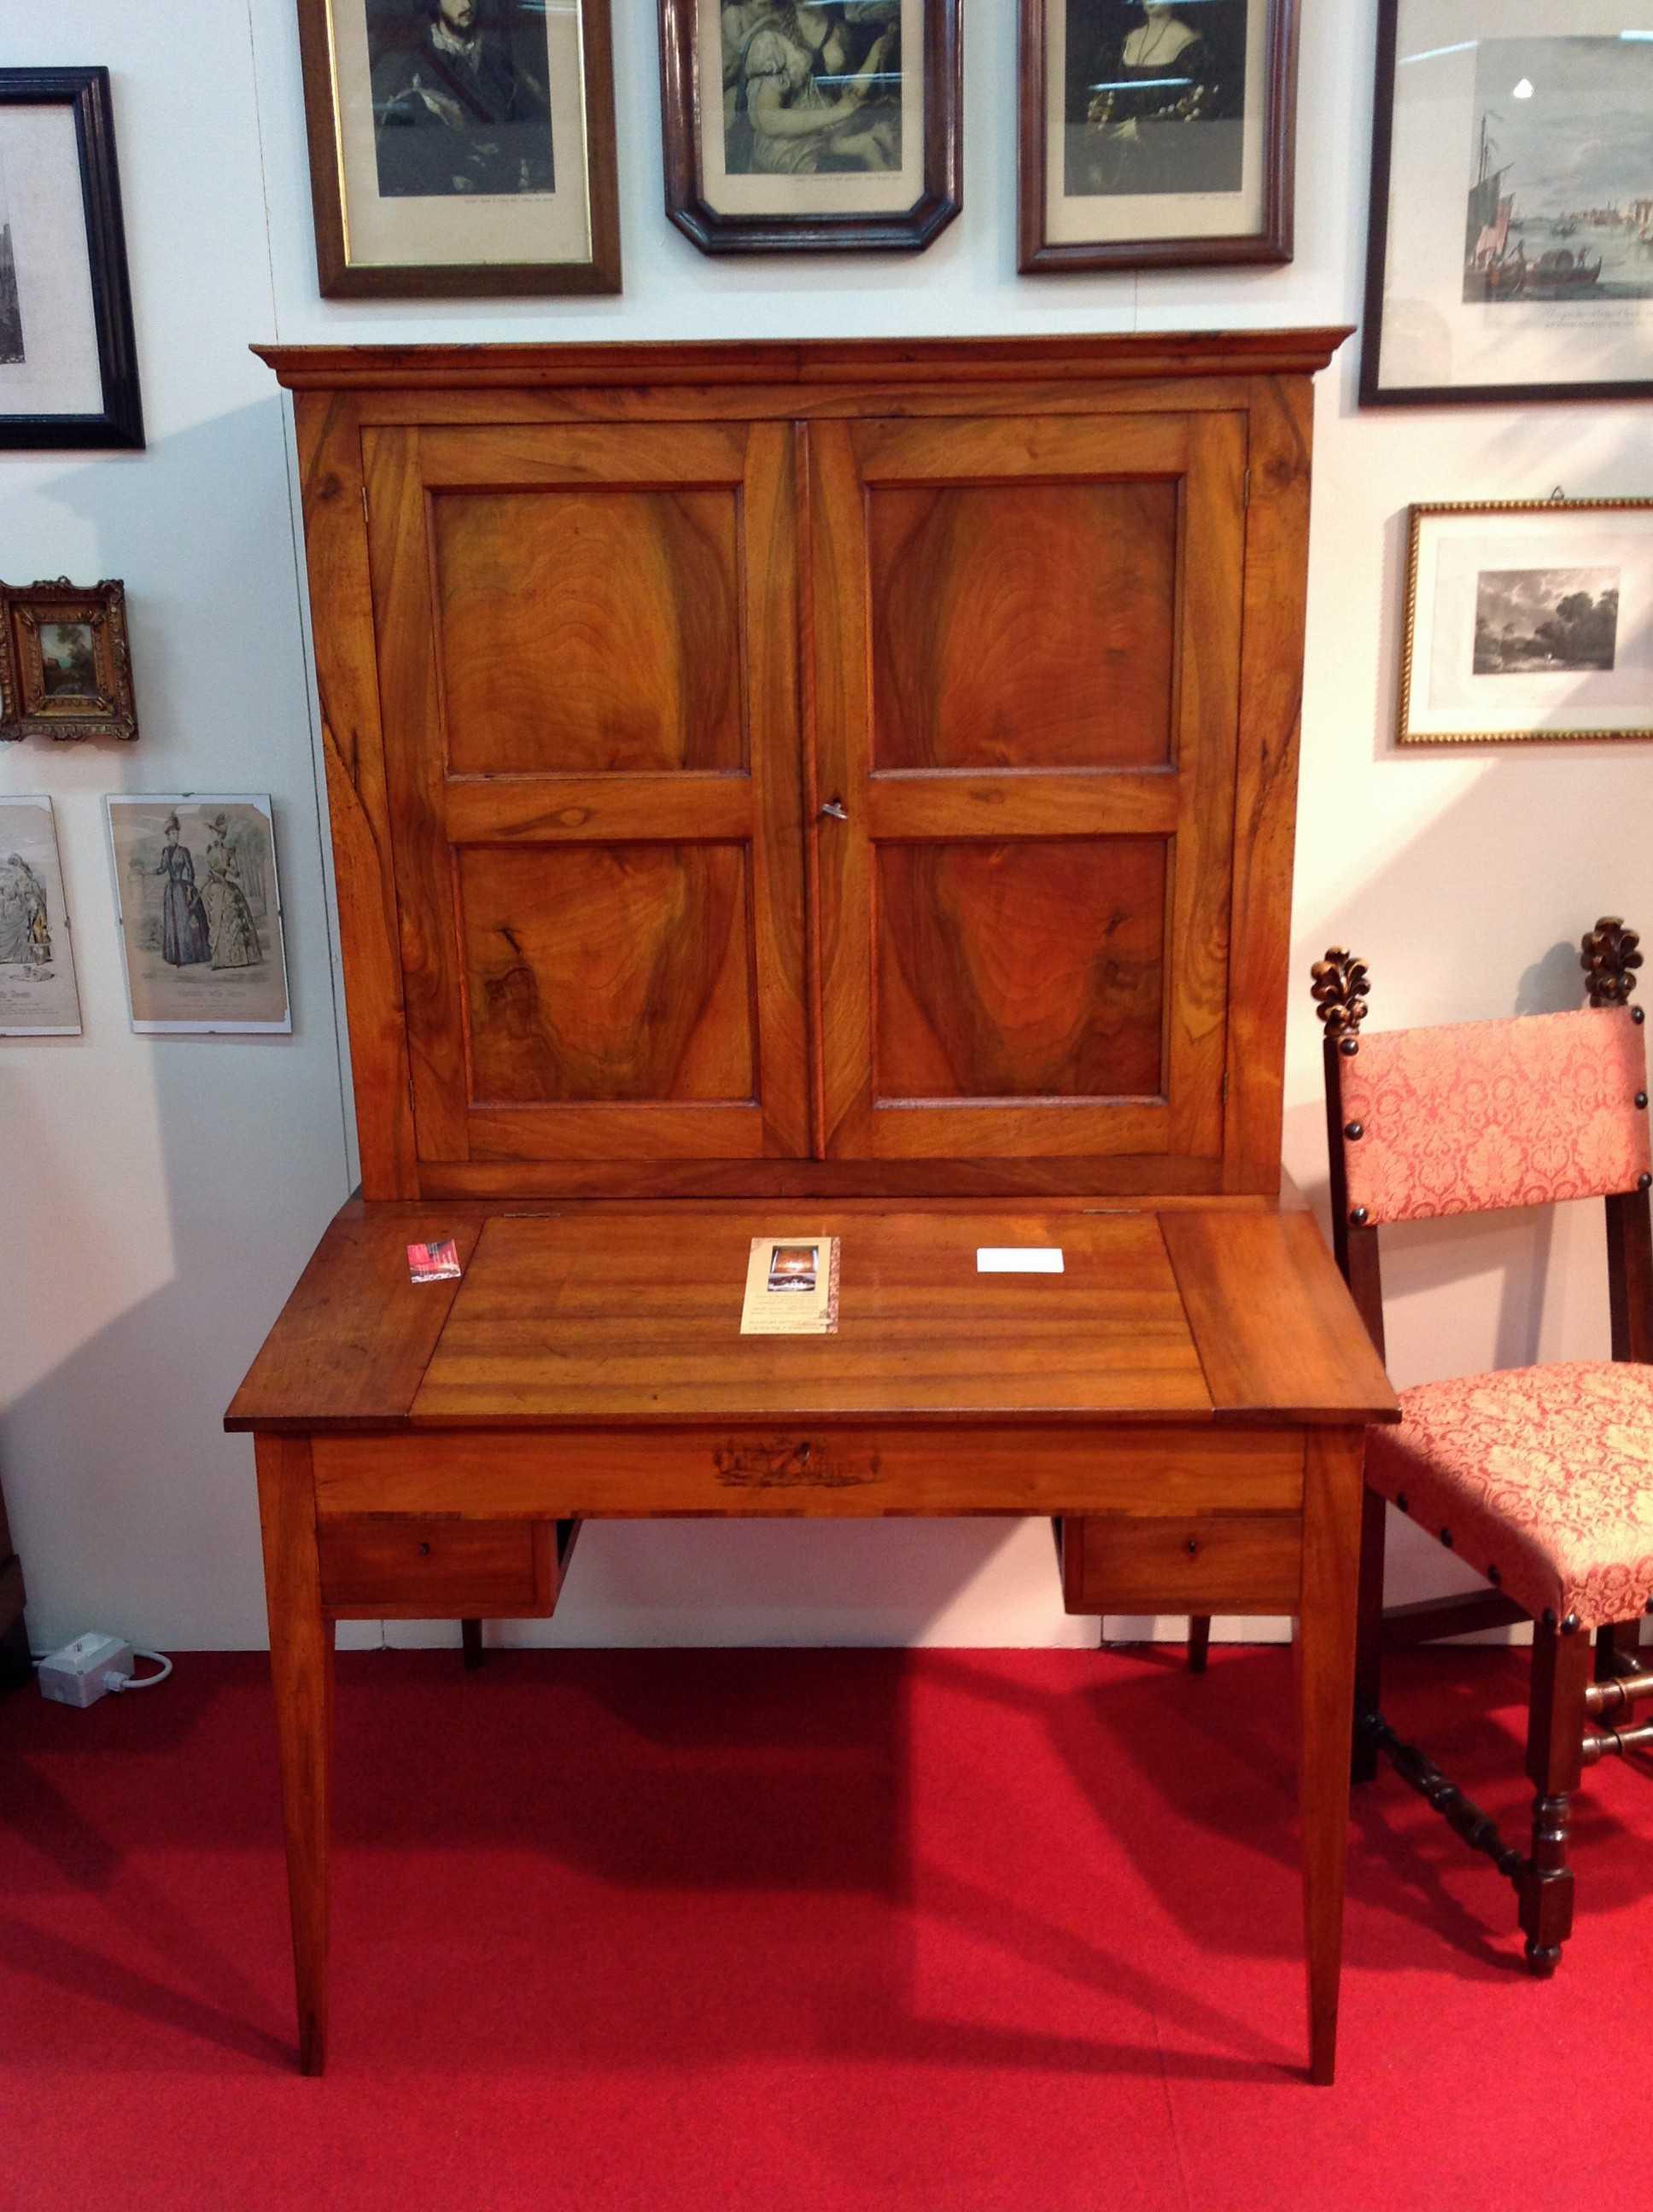 Scrivania luigi xvi arredamento mobili antiquariato musetti for Arredamento luigi xvi